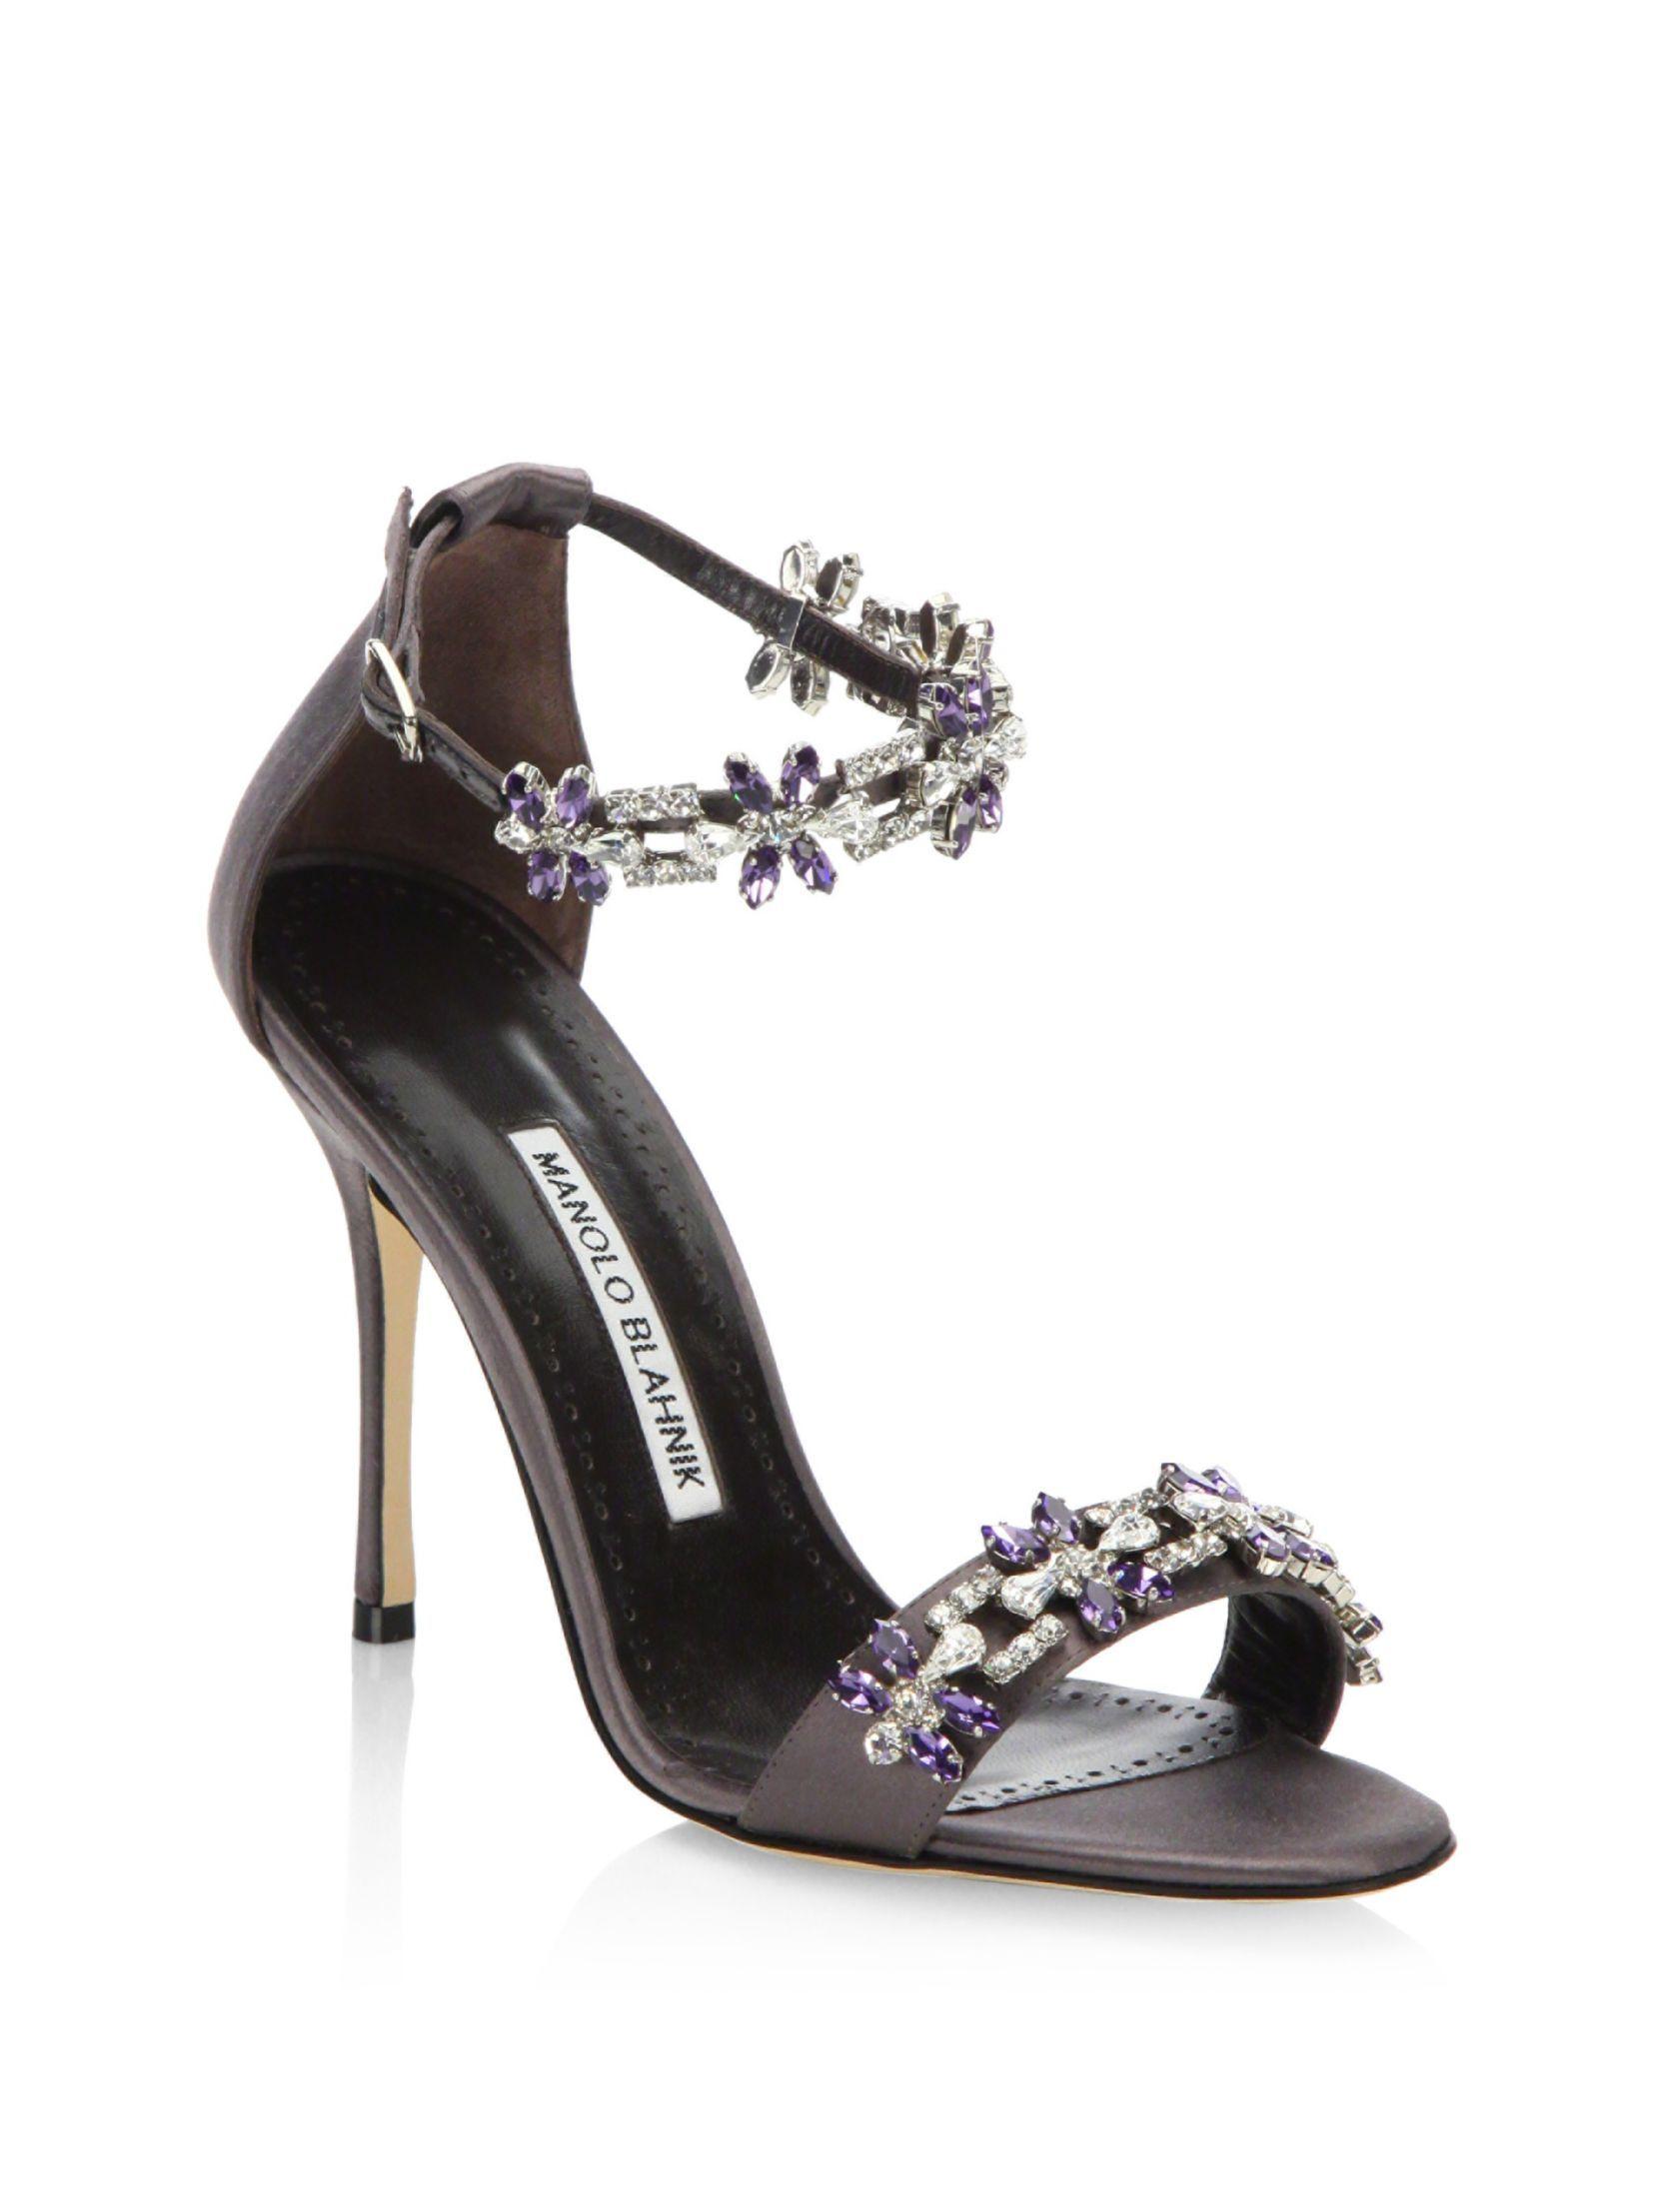 Manolo Blahnik Firaduo Embellished Satin Sandals, Gray